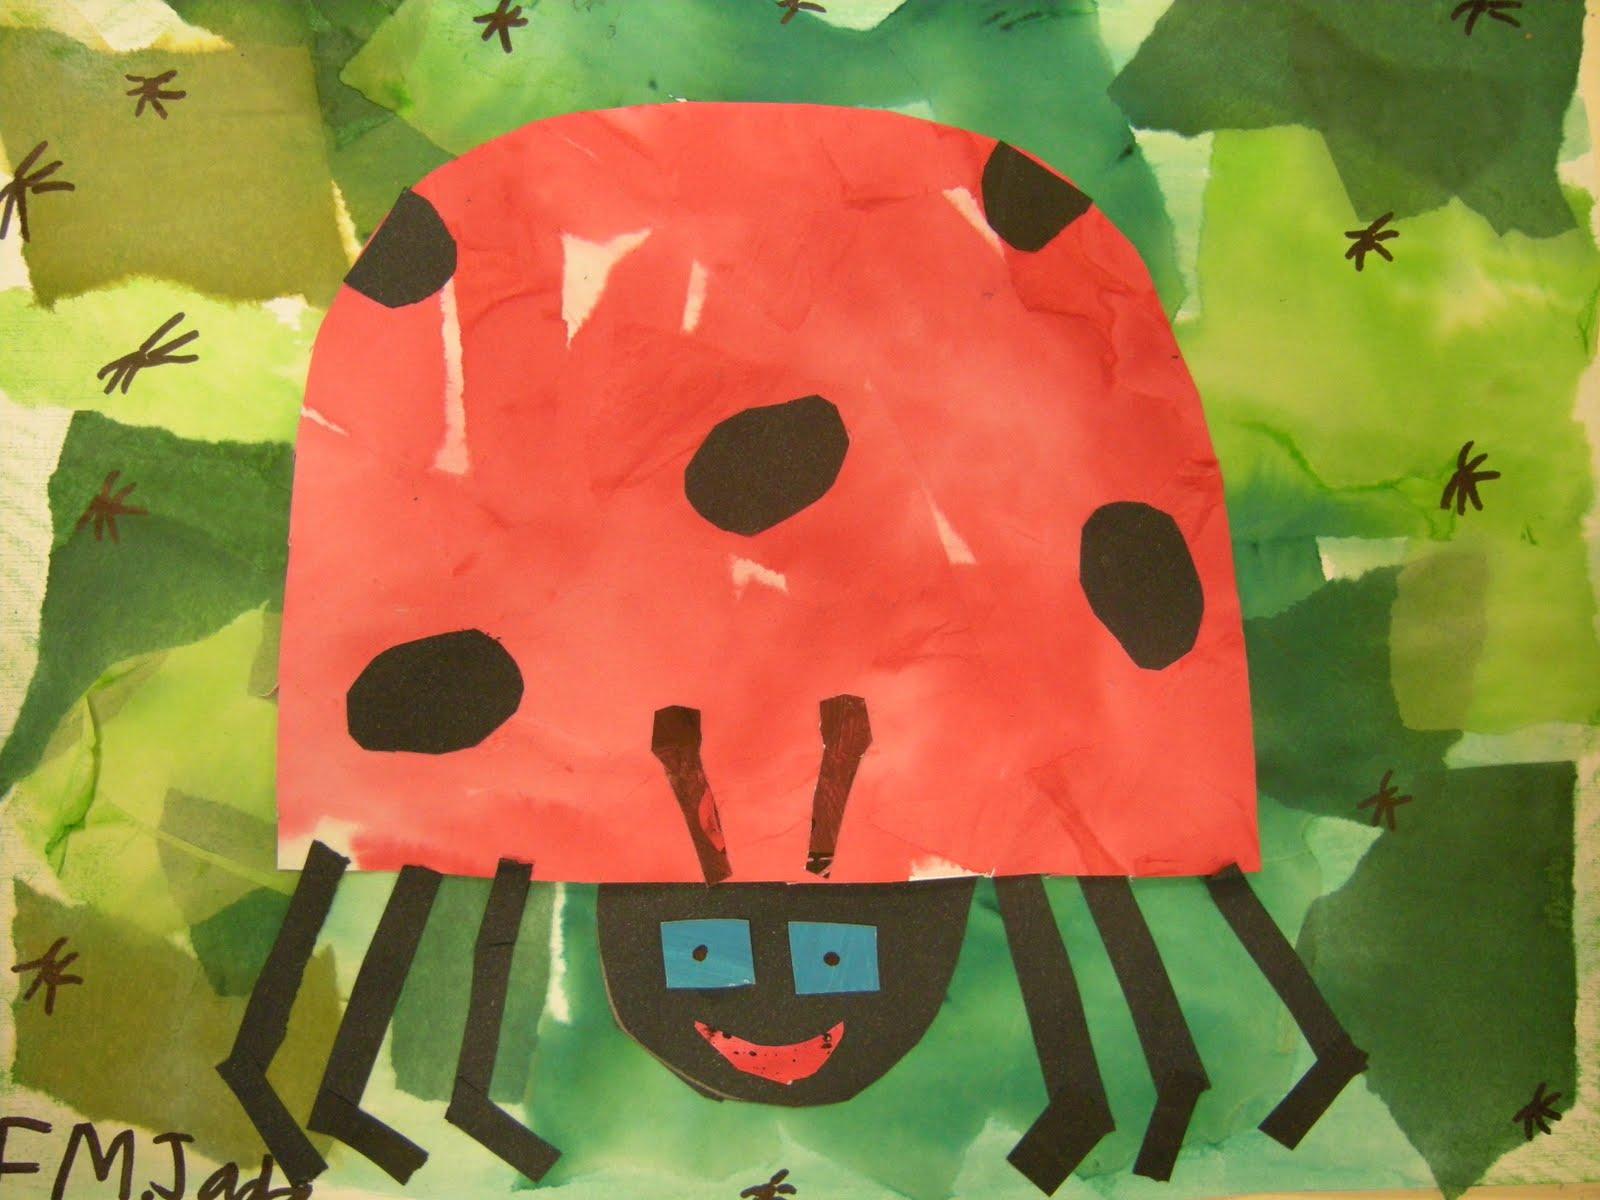 Artolazzi: The Grouchy Lady Bug